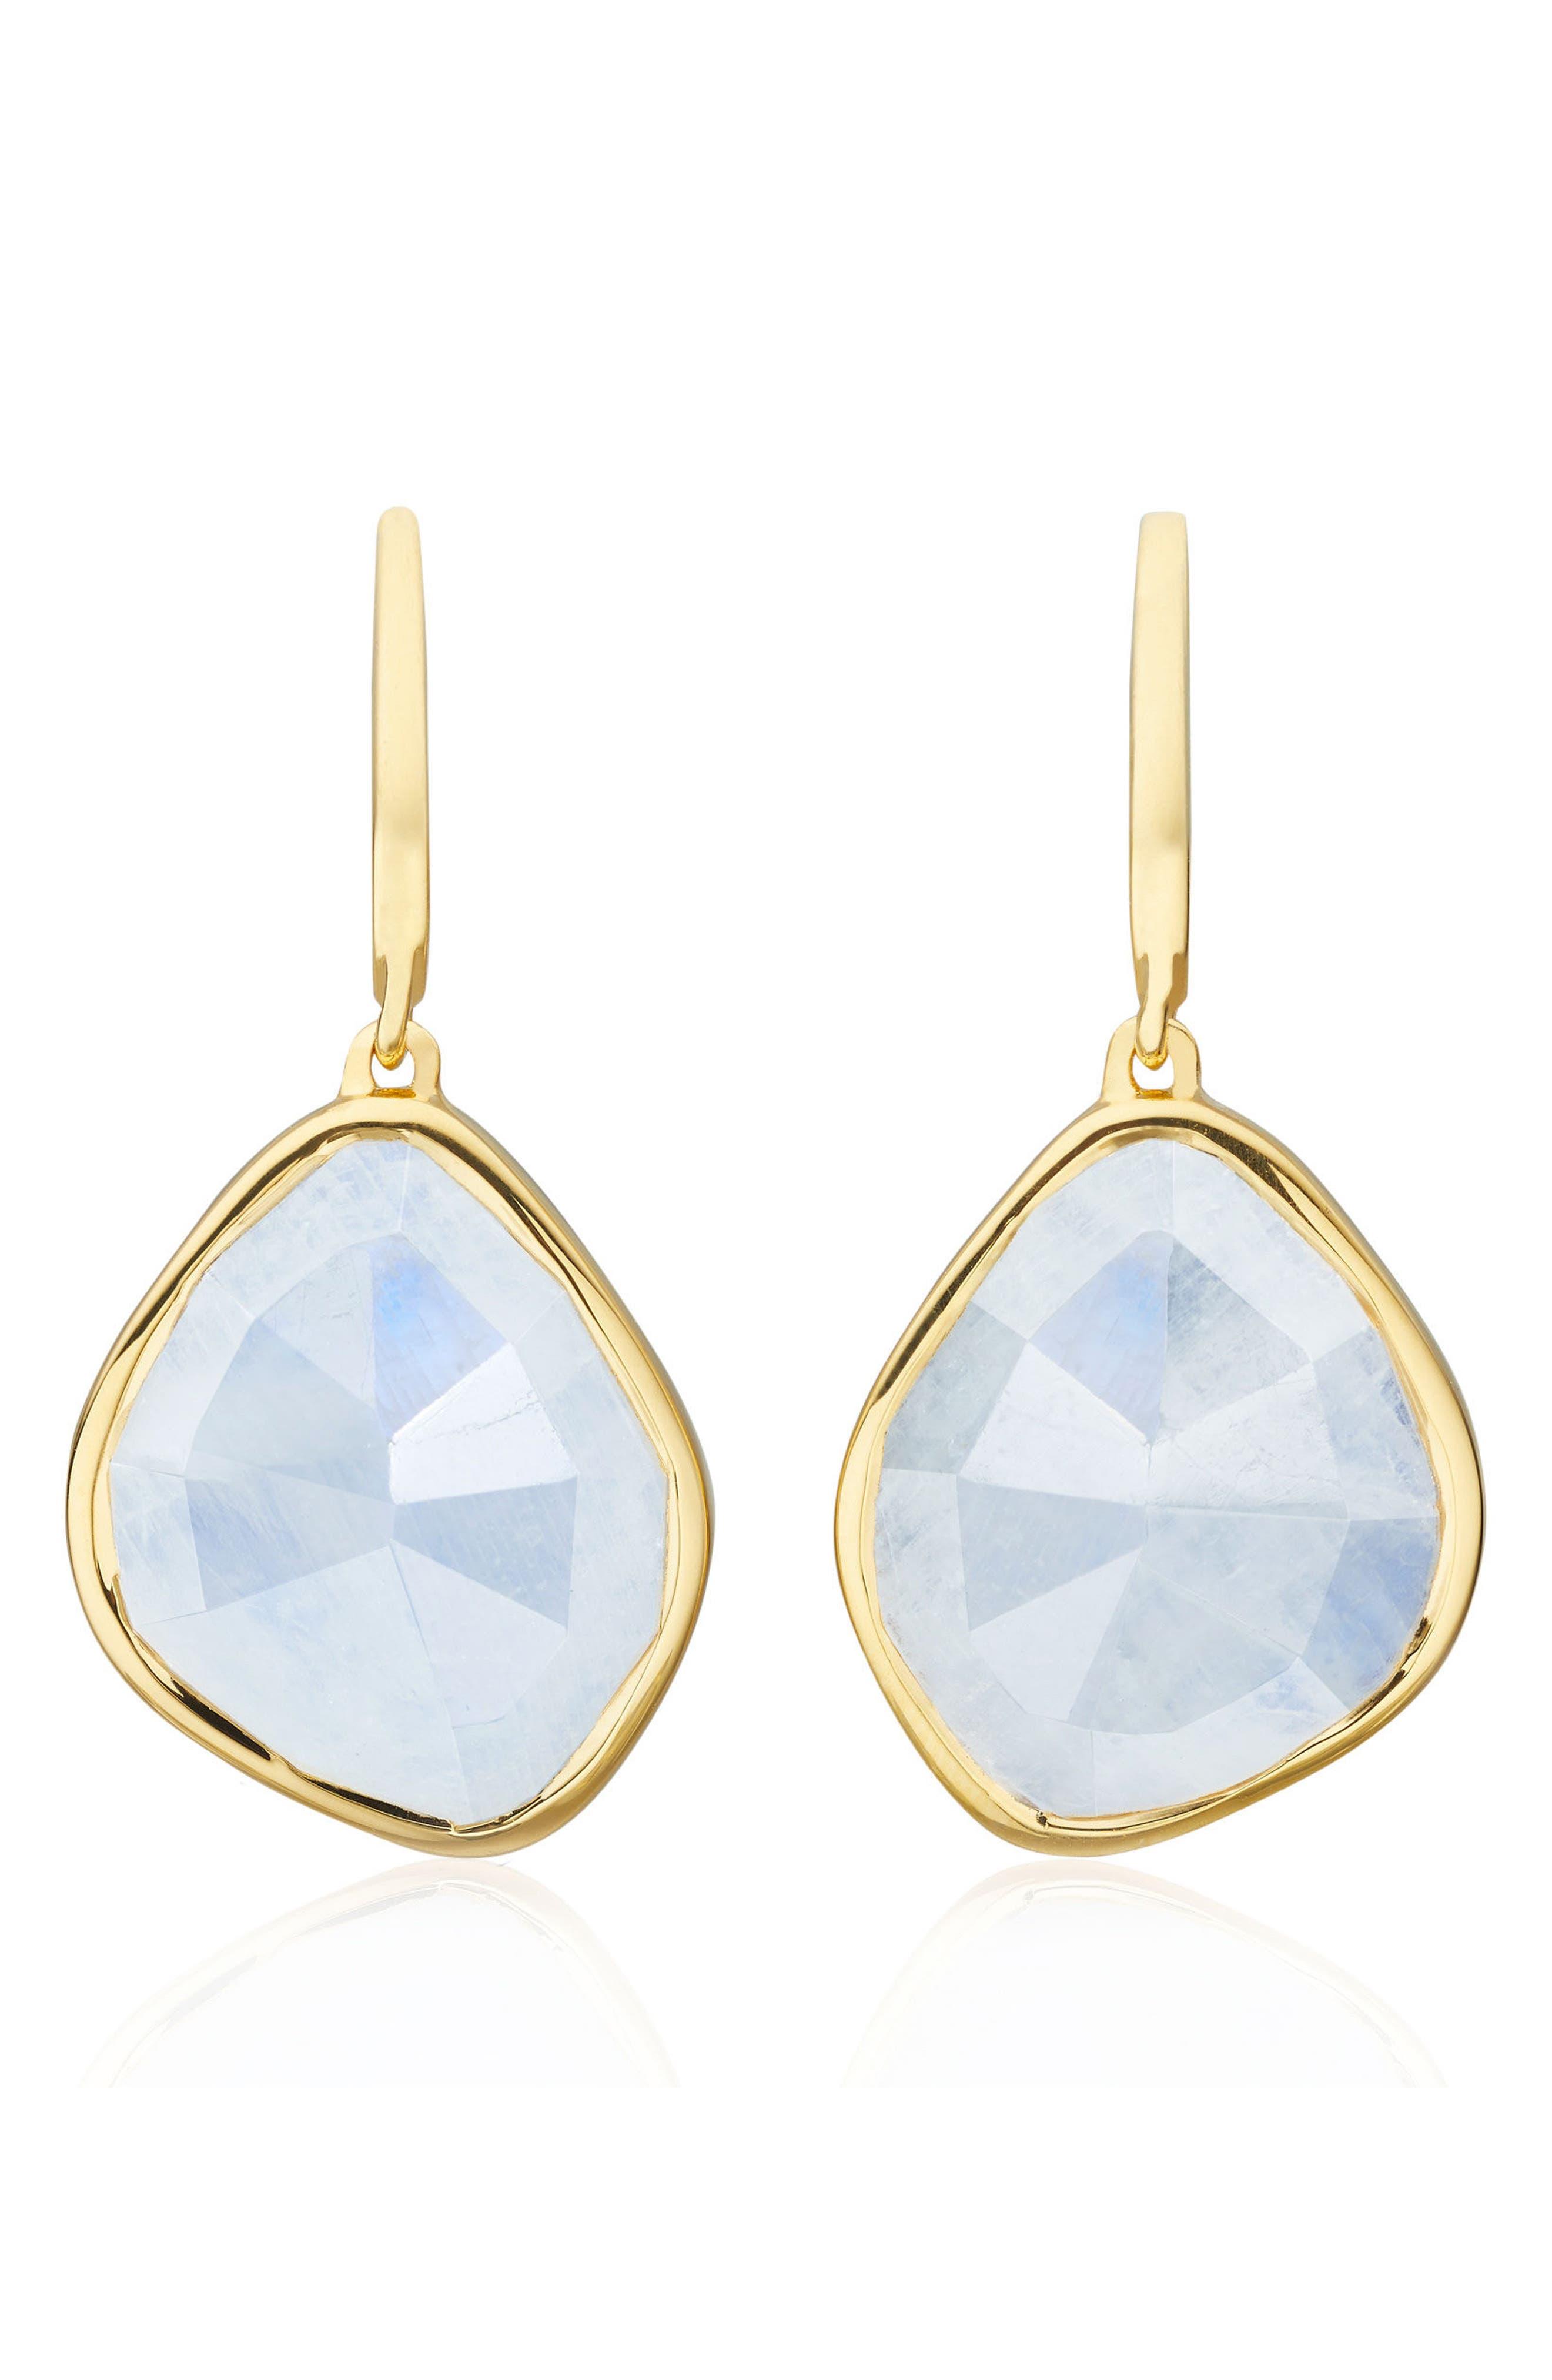 Siren Nugget Semiprecious Stone Drop Earrings,                             Main thumbnail 1, color,                             Yellow Gold/ Moonstone